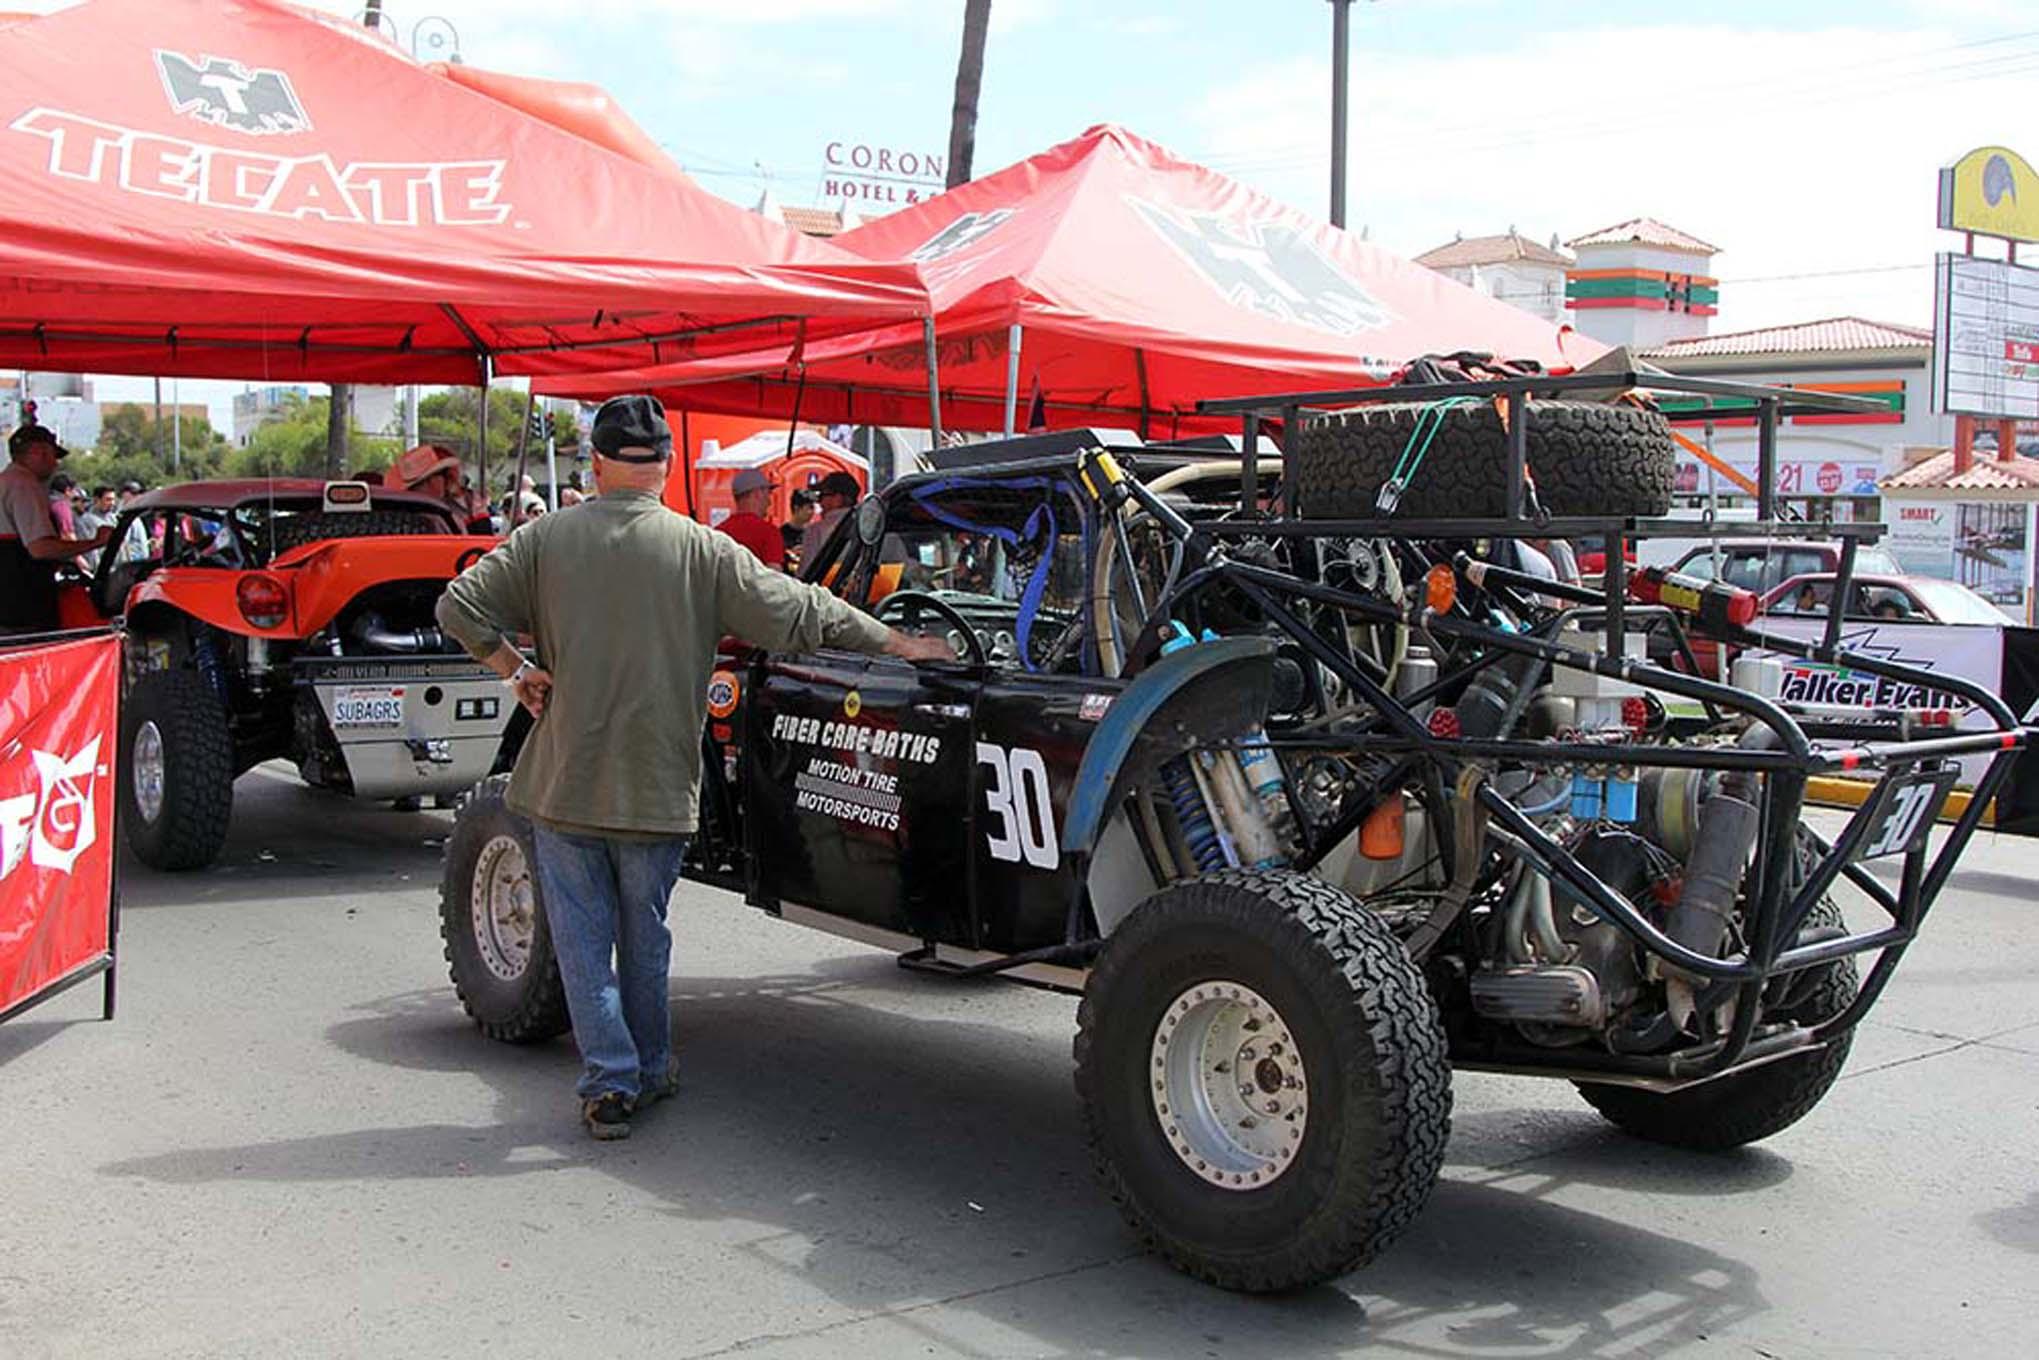 105NORRA Mexican 1000 BAJA offroad Race 2015 Manx Nova Chevy James Garner